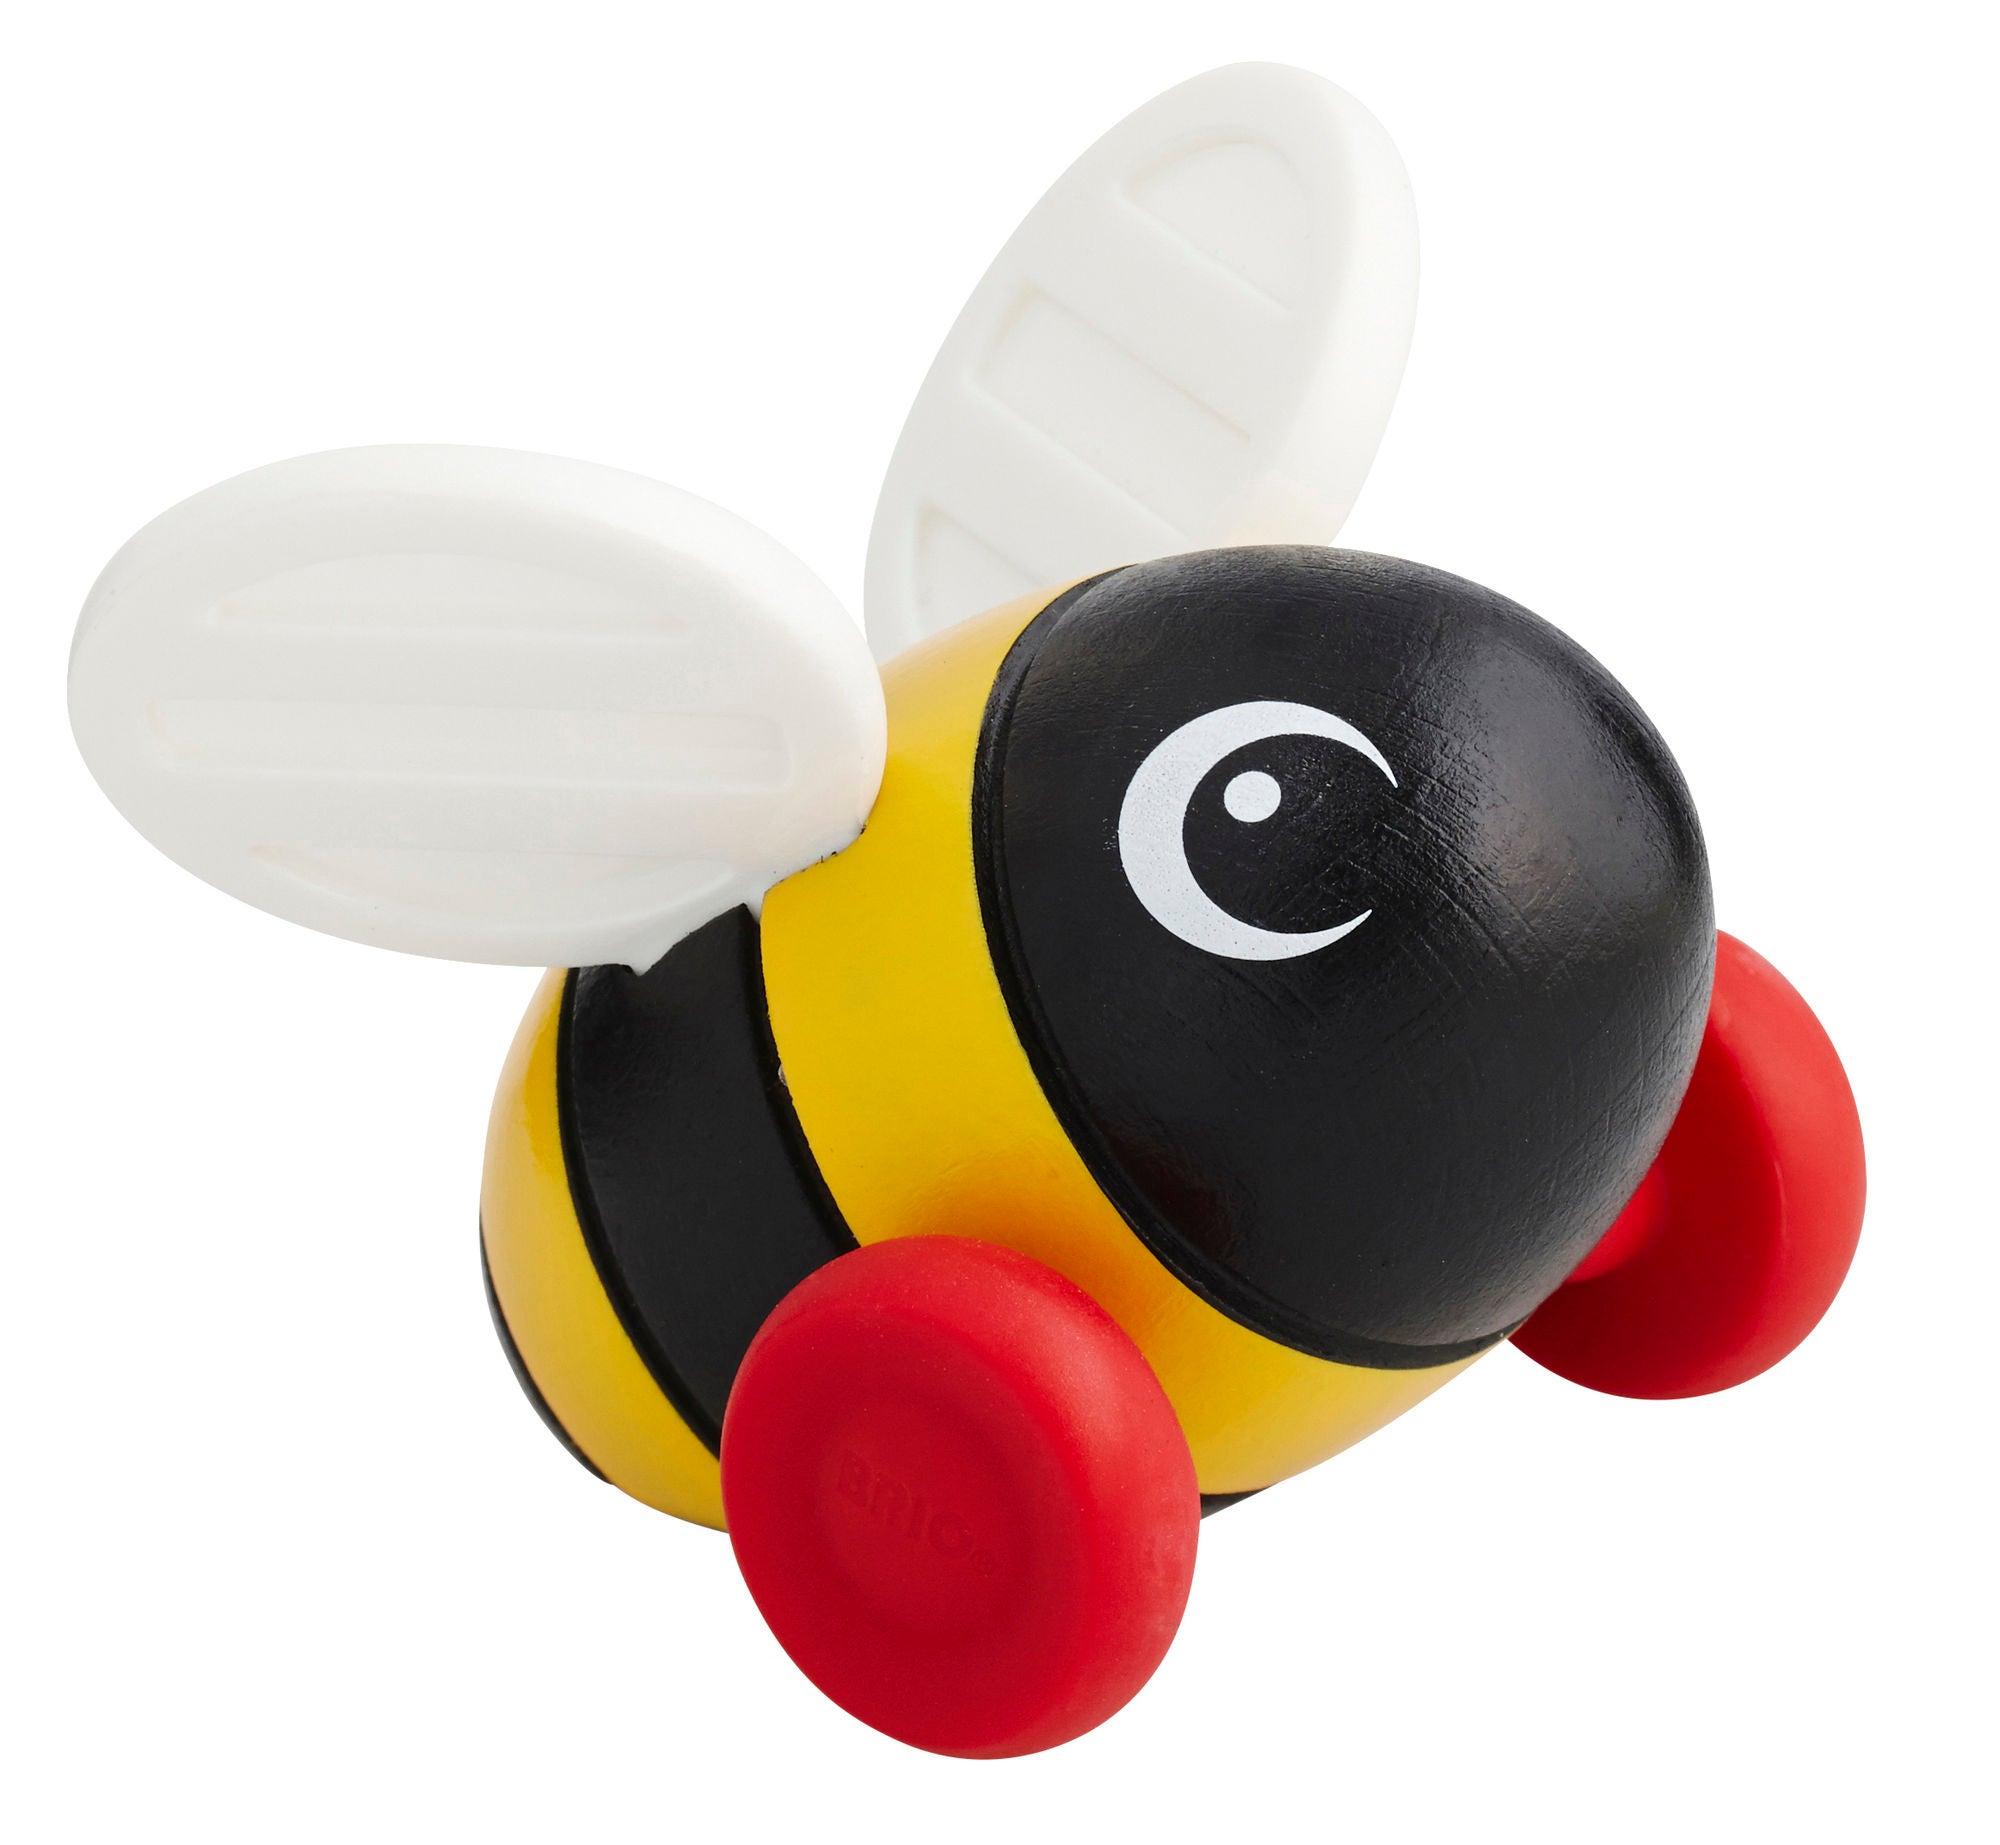 Kuinka suuri on mehiläiset munaa